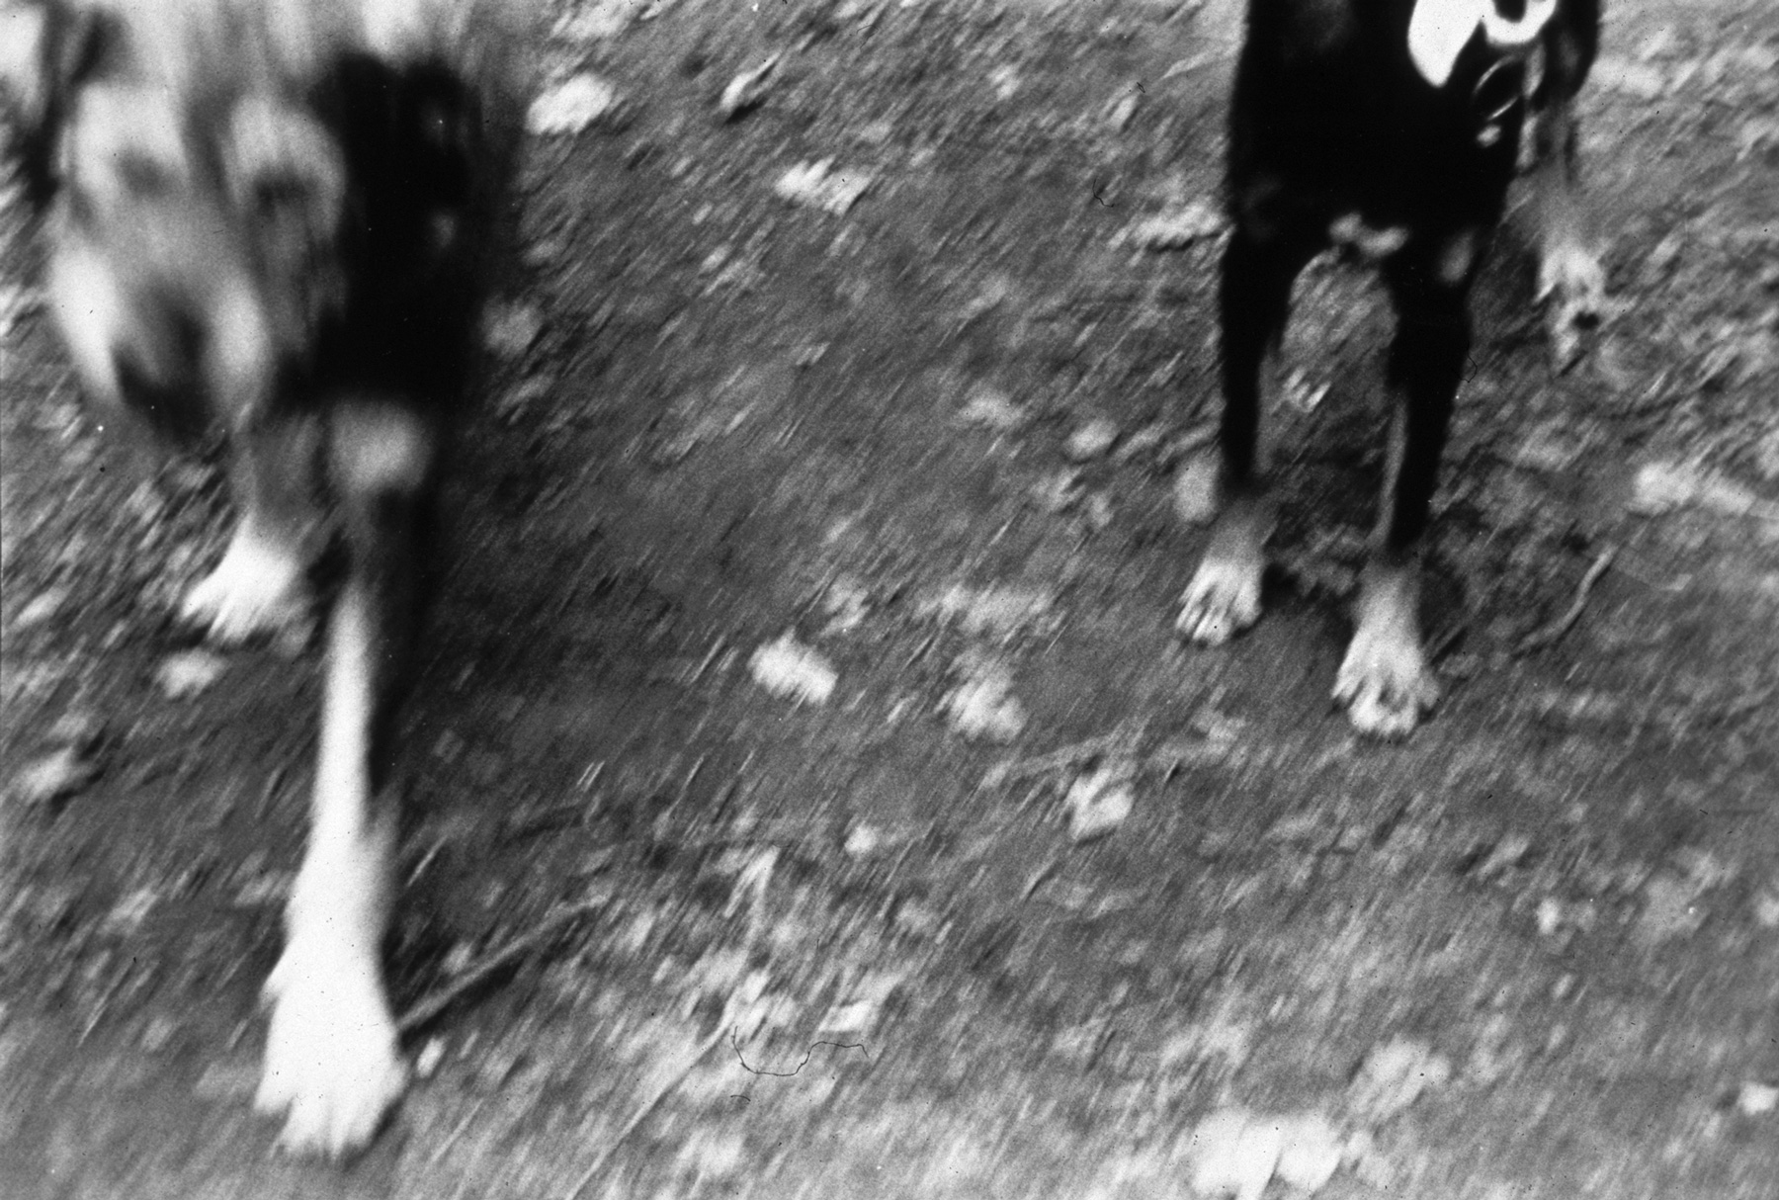 Dogs No.1